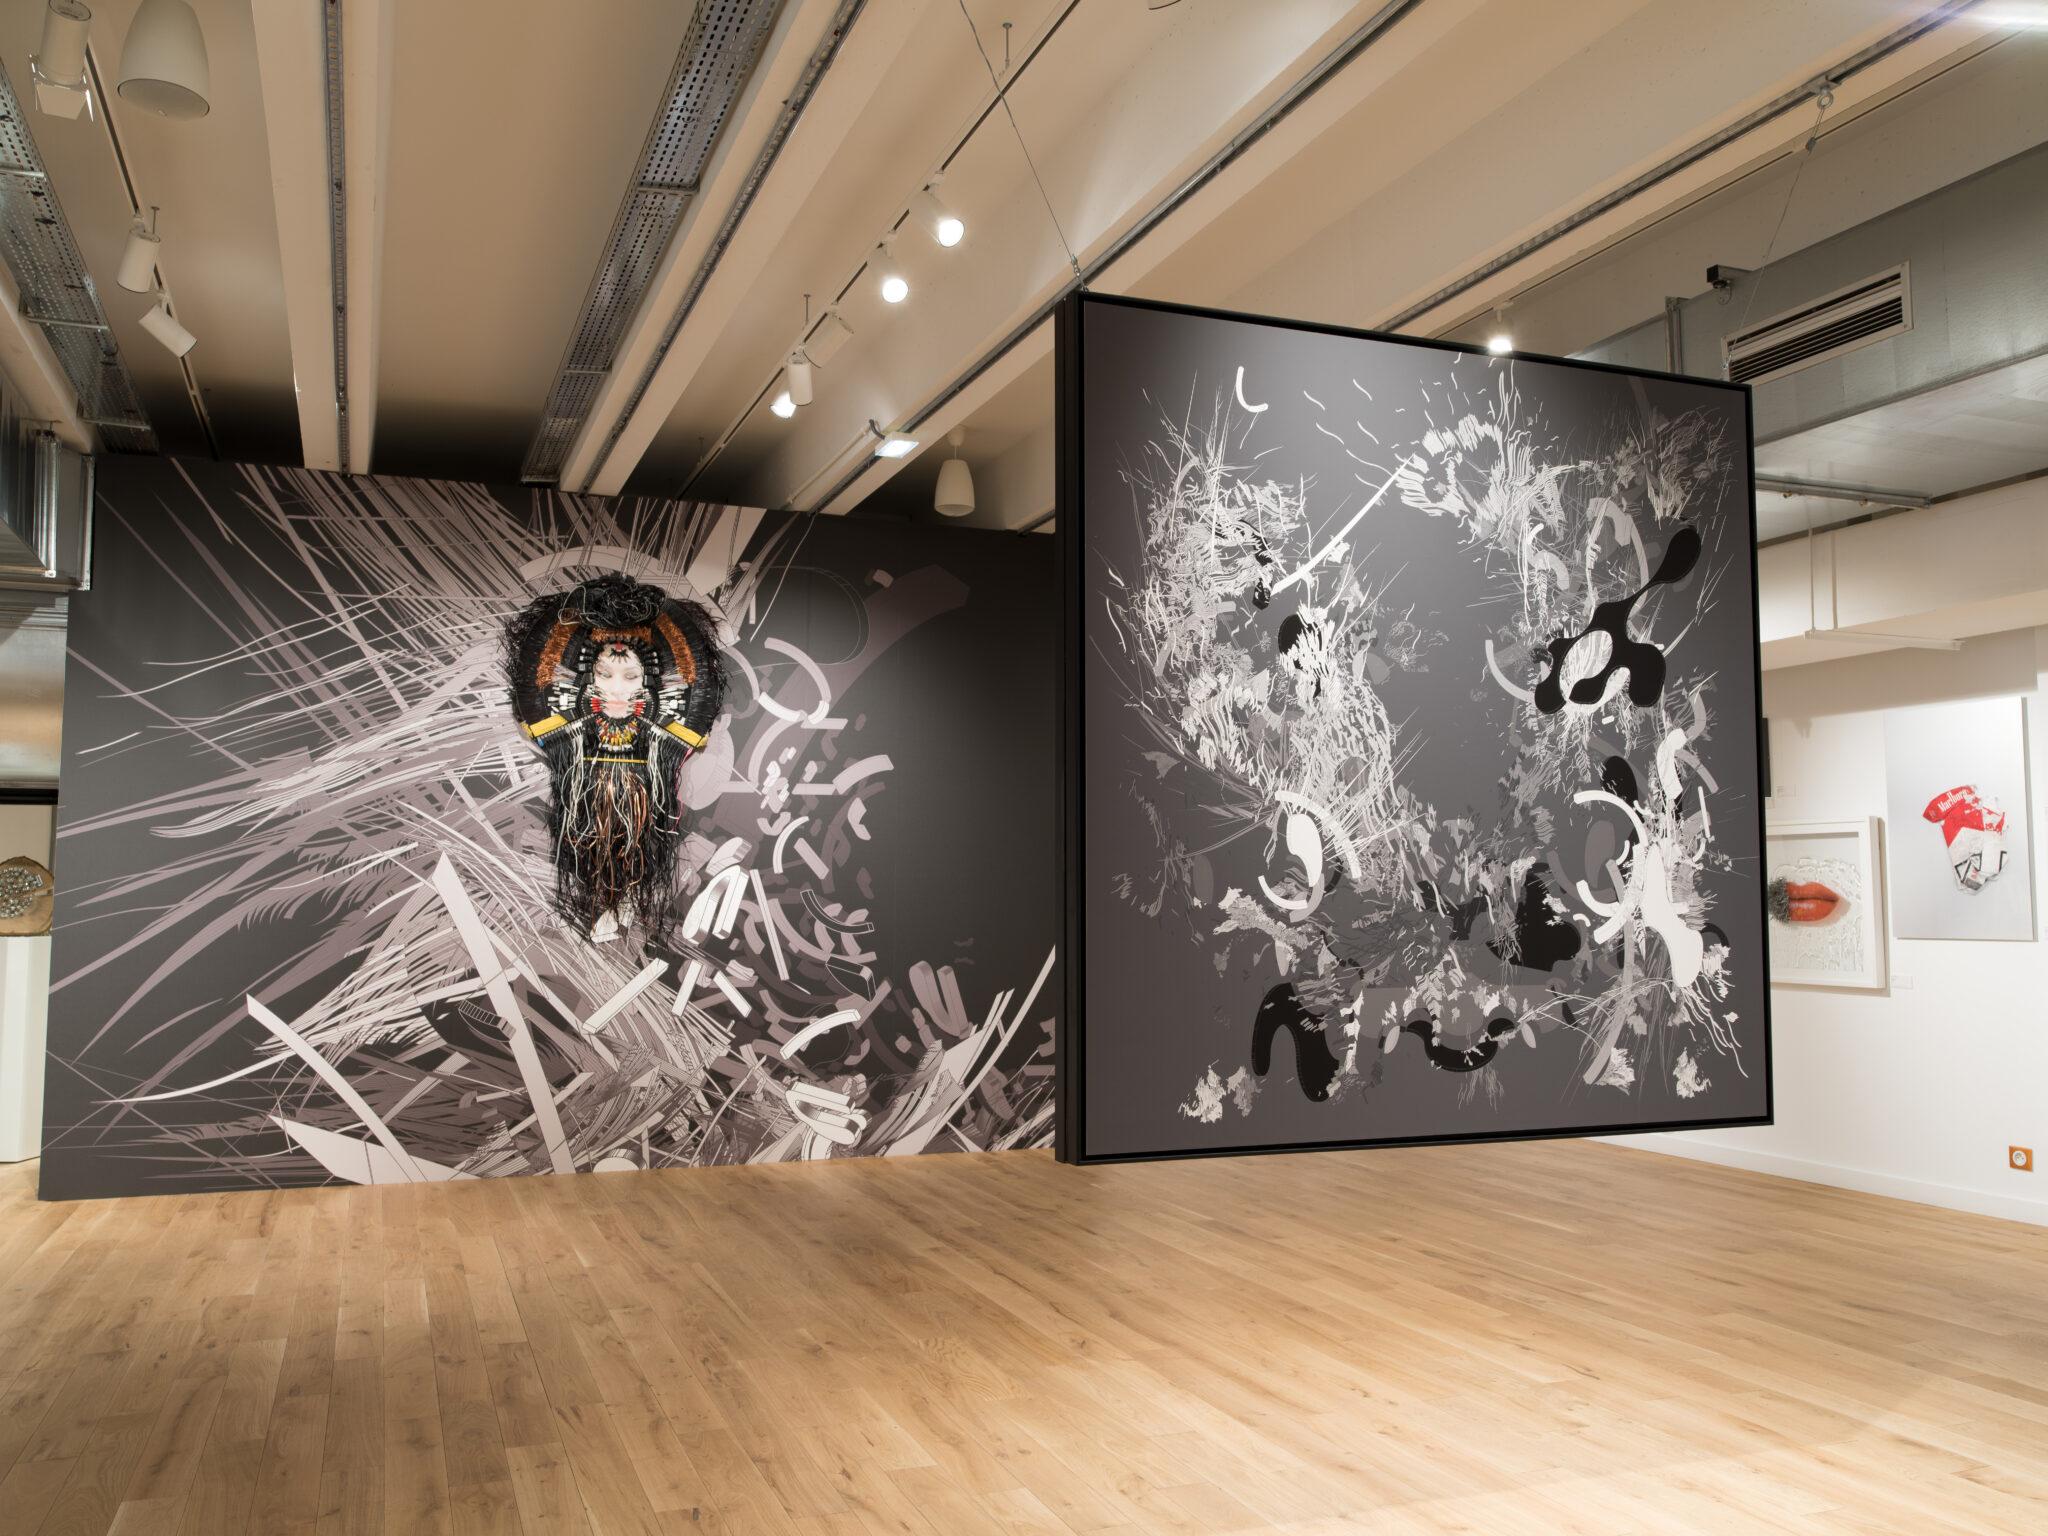 audrey-hatchikian-gallery-flagrant-délire-sacha-haillote-rodolphe-barsikian-duo-show-art